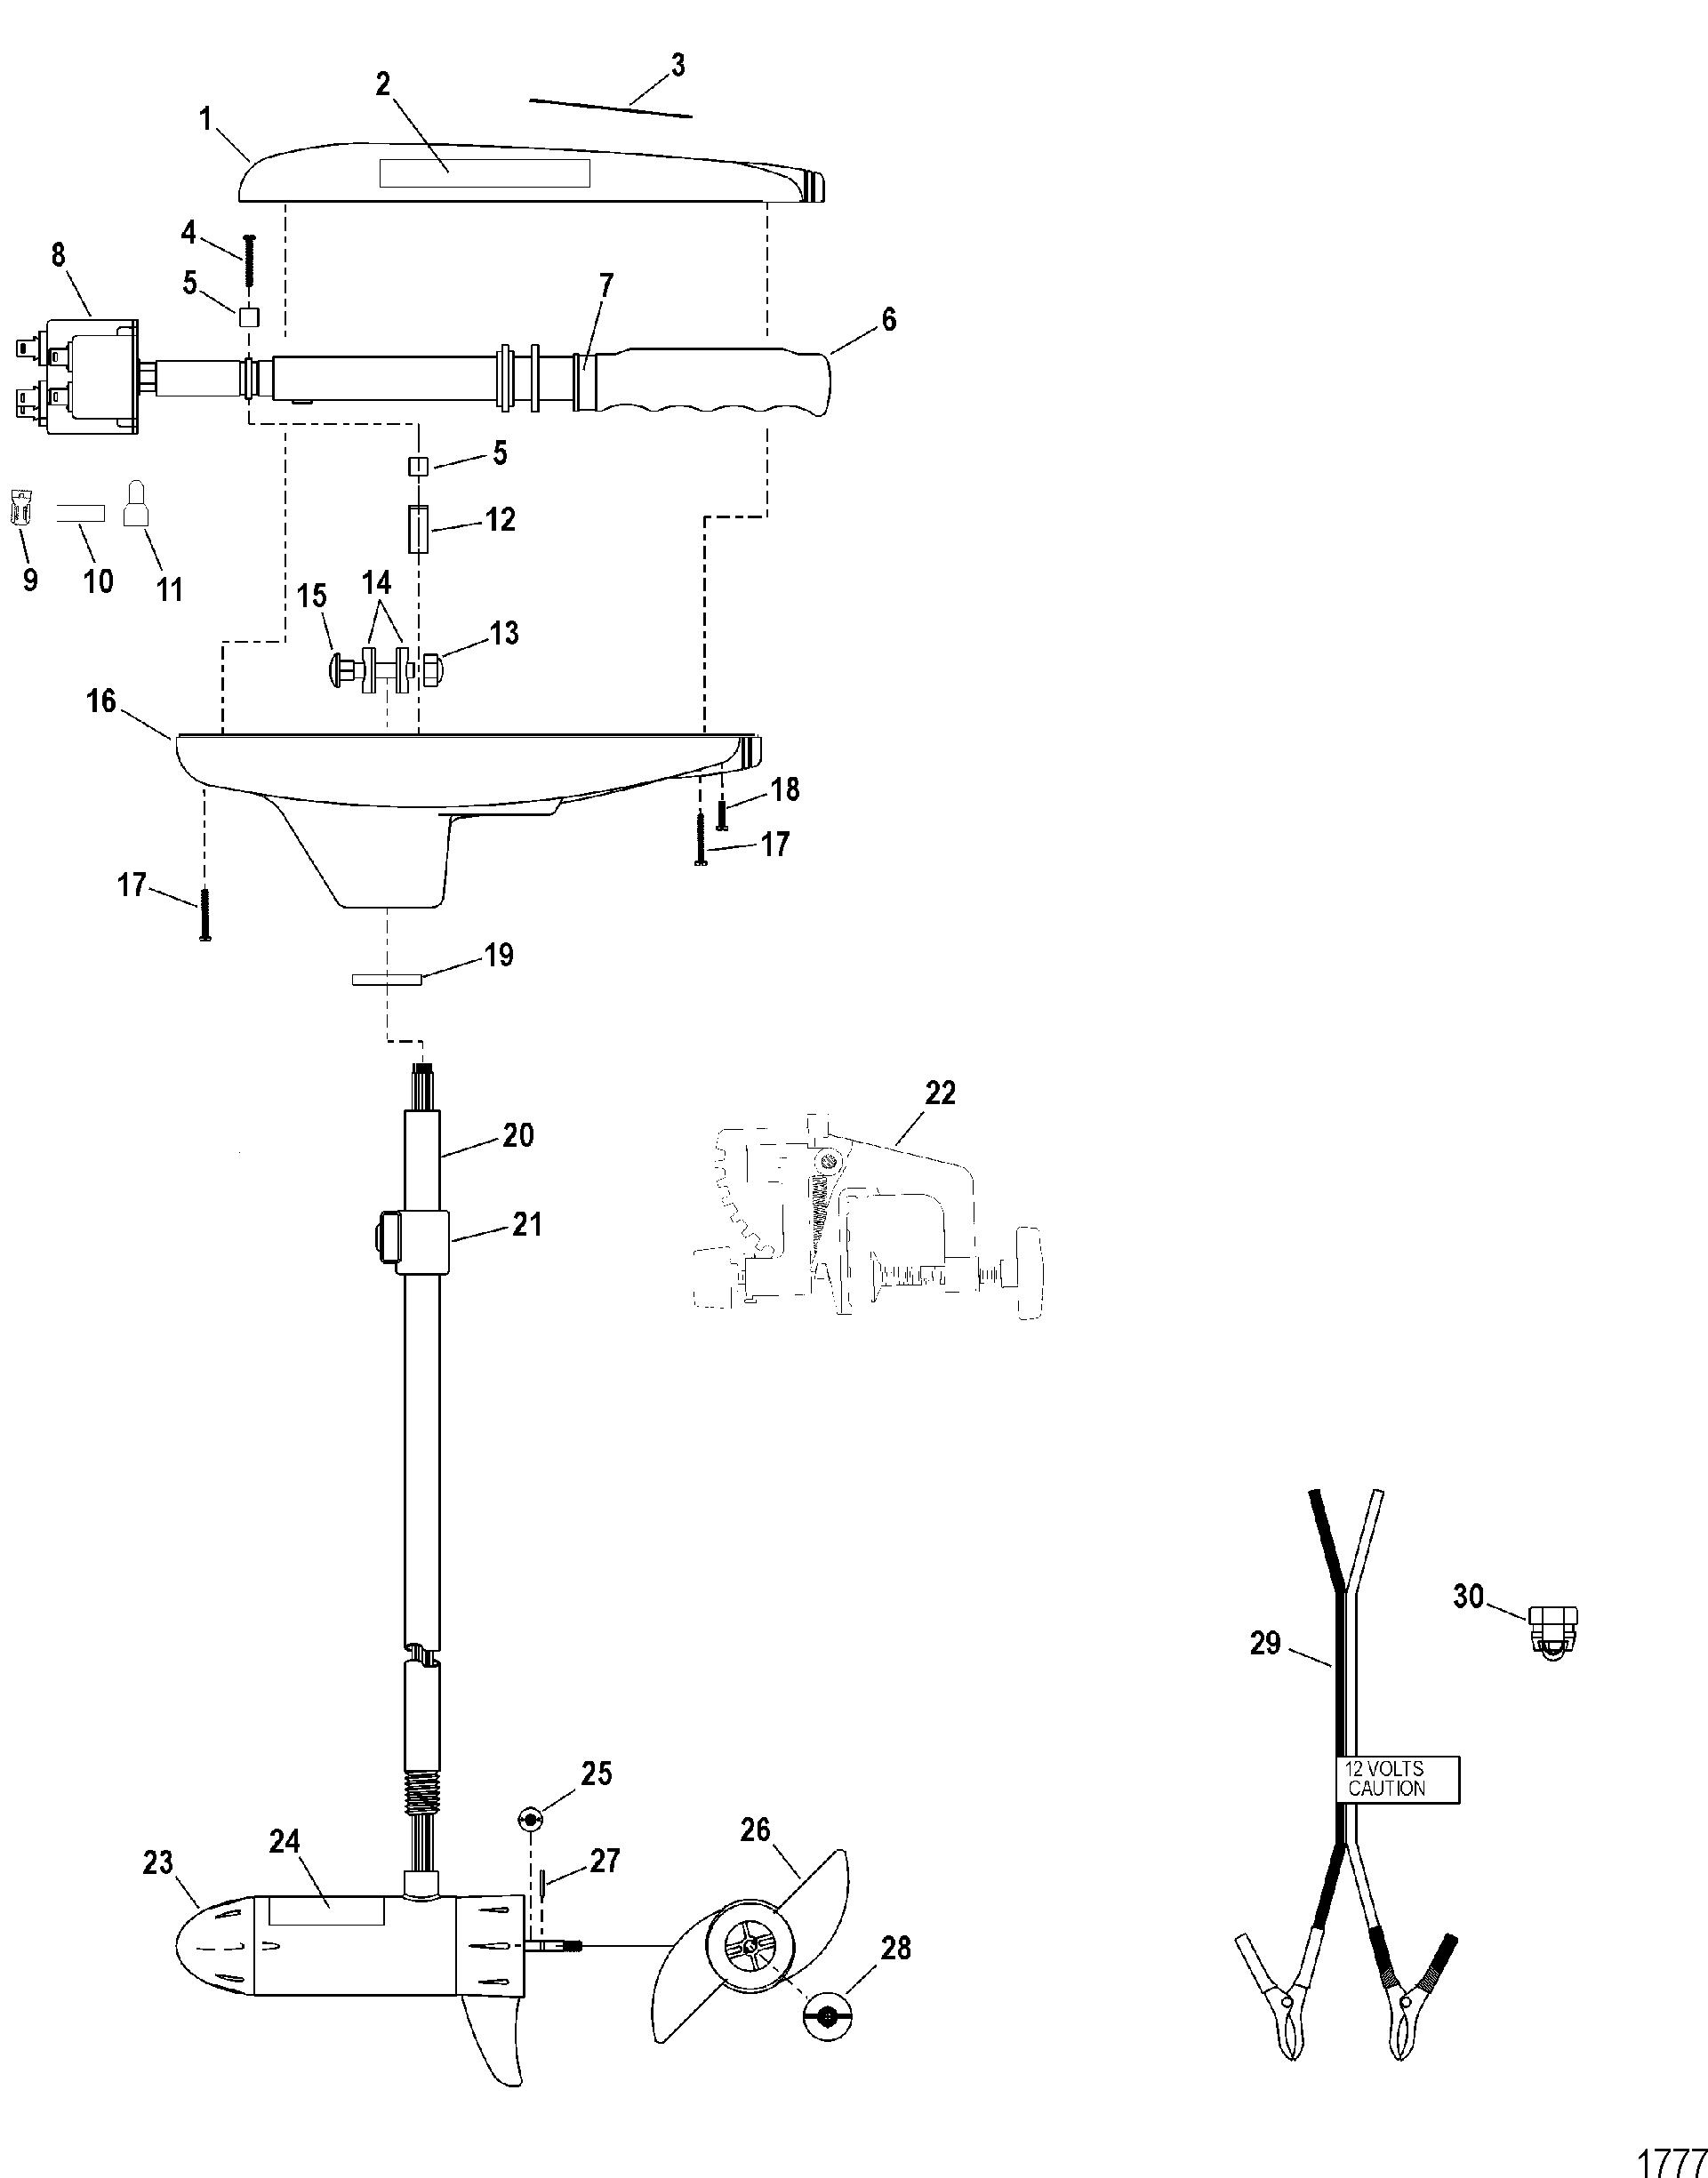 Motorguide Motor Wiring Diagram Replacing Picturesque Www Brute Mercury Trolling Thruster Series U Com Plus 1921x2450